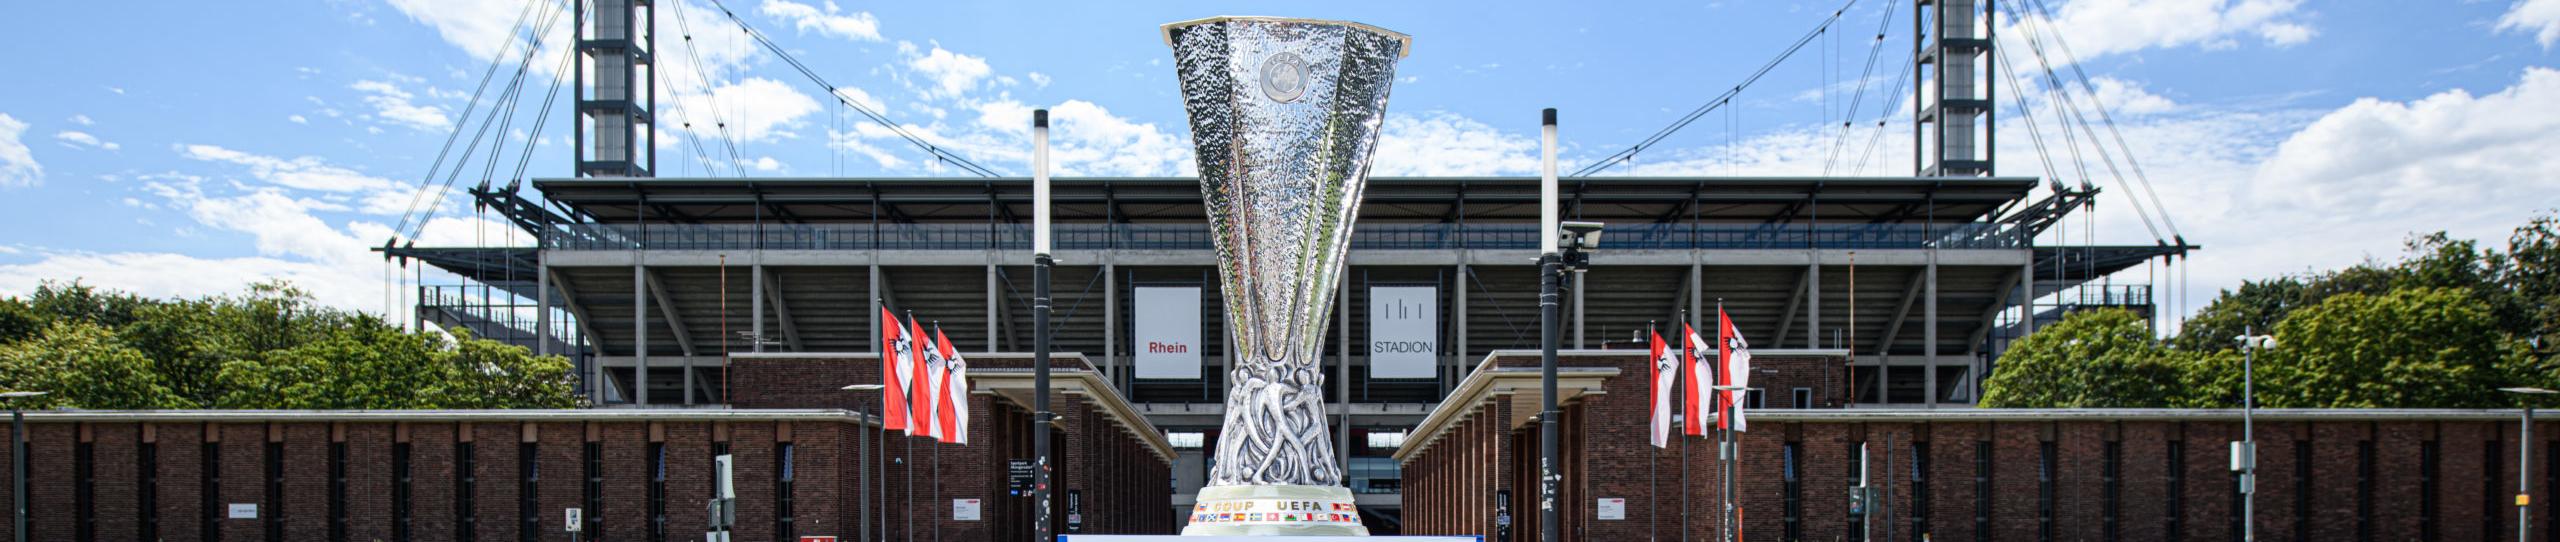 Siviglia-Inter, la finale è servita: andalusi esperti in finali, nerazzurri pronti all'impresa